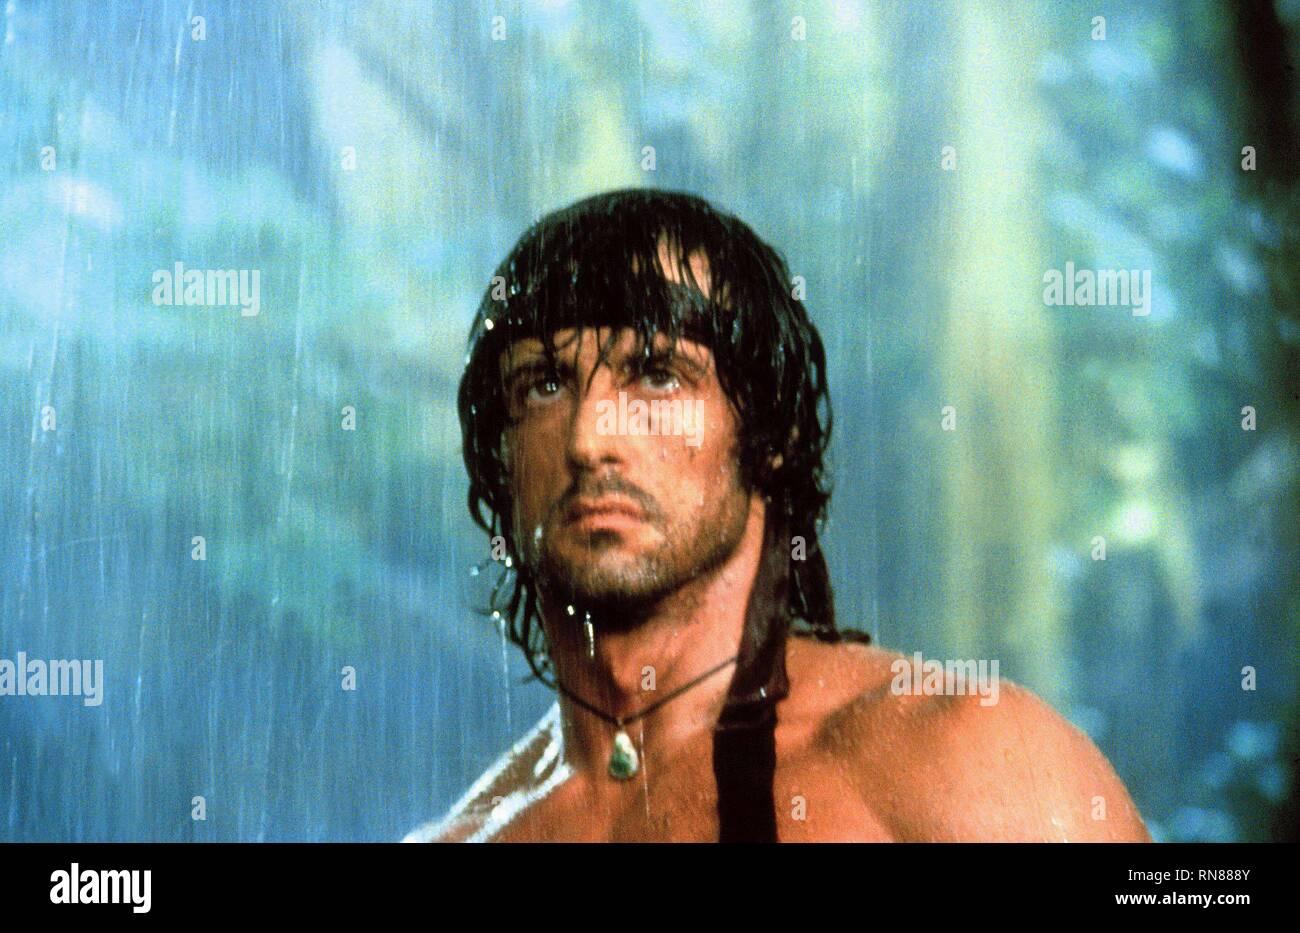 Rambo Film Still Stock Photos & Rambo Film Still Stock